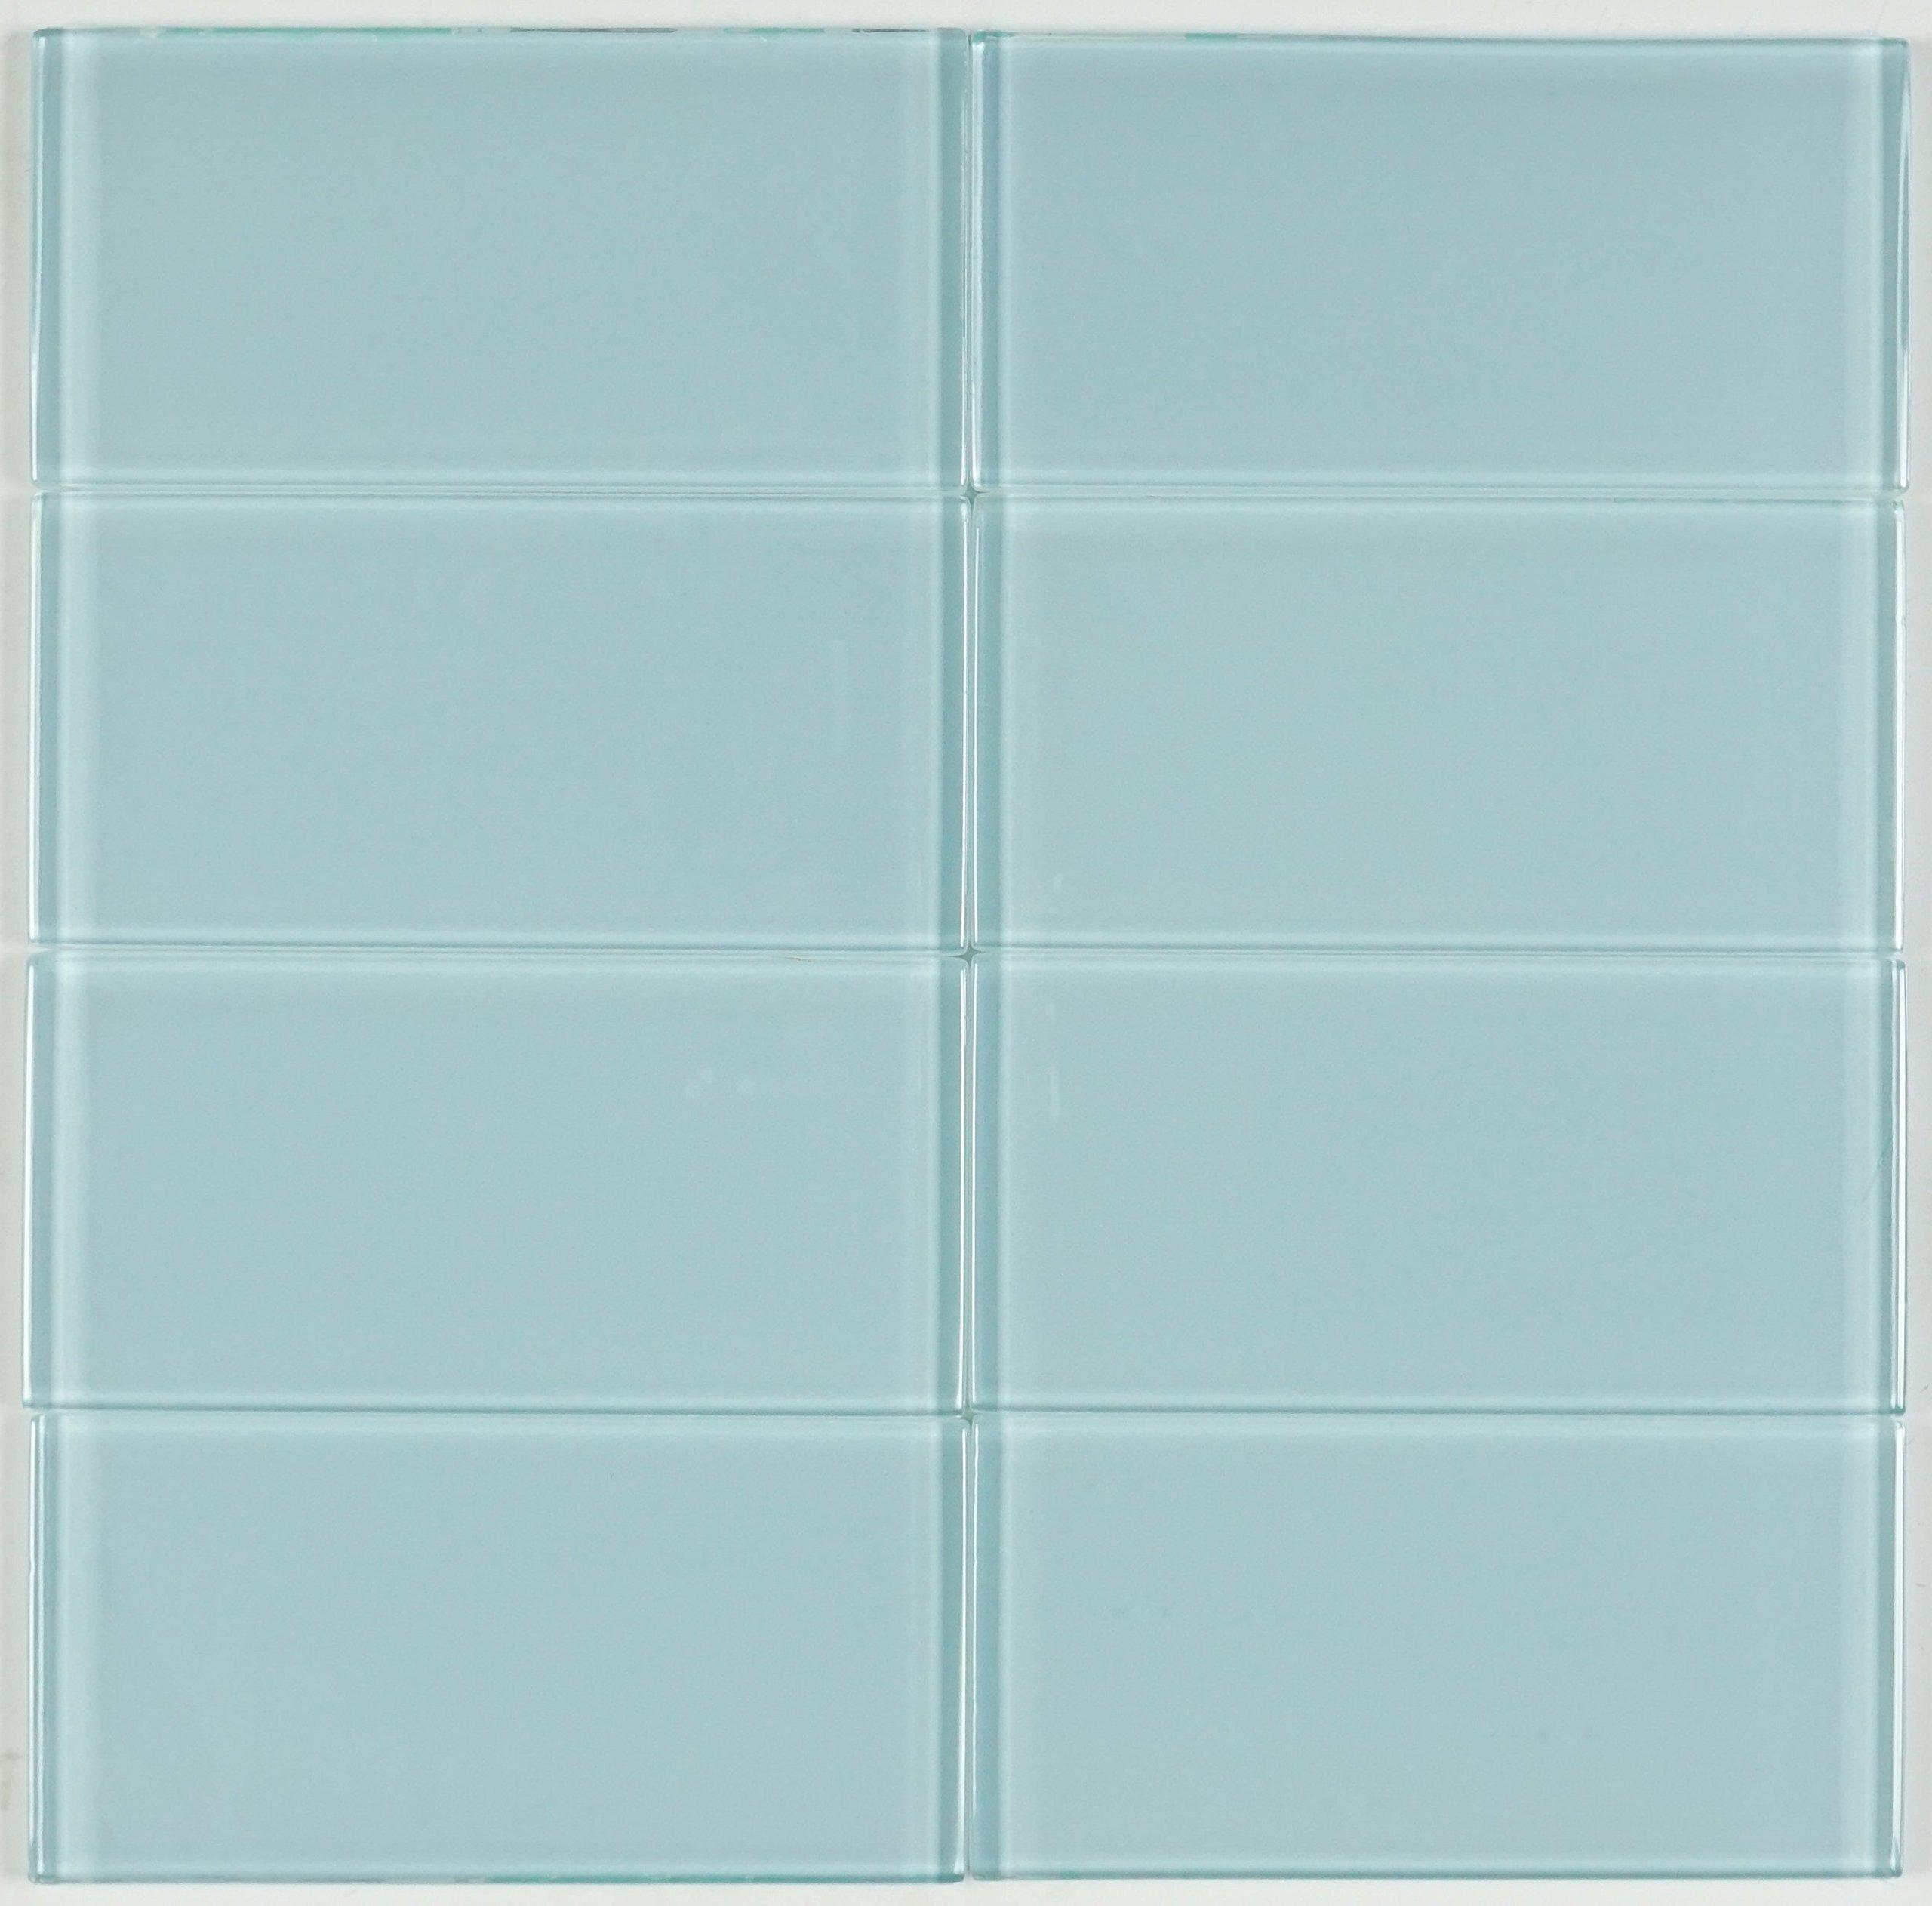 THG-17 Ocean green subway tile 3x6 - Kitchen and Bath Backsplash Wall Tile(8pcs)